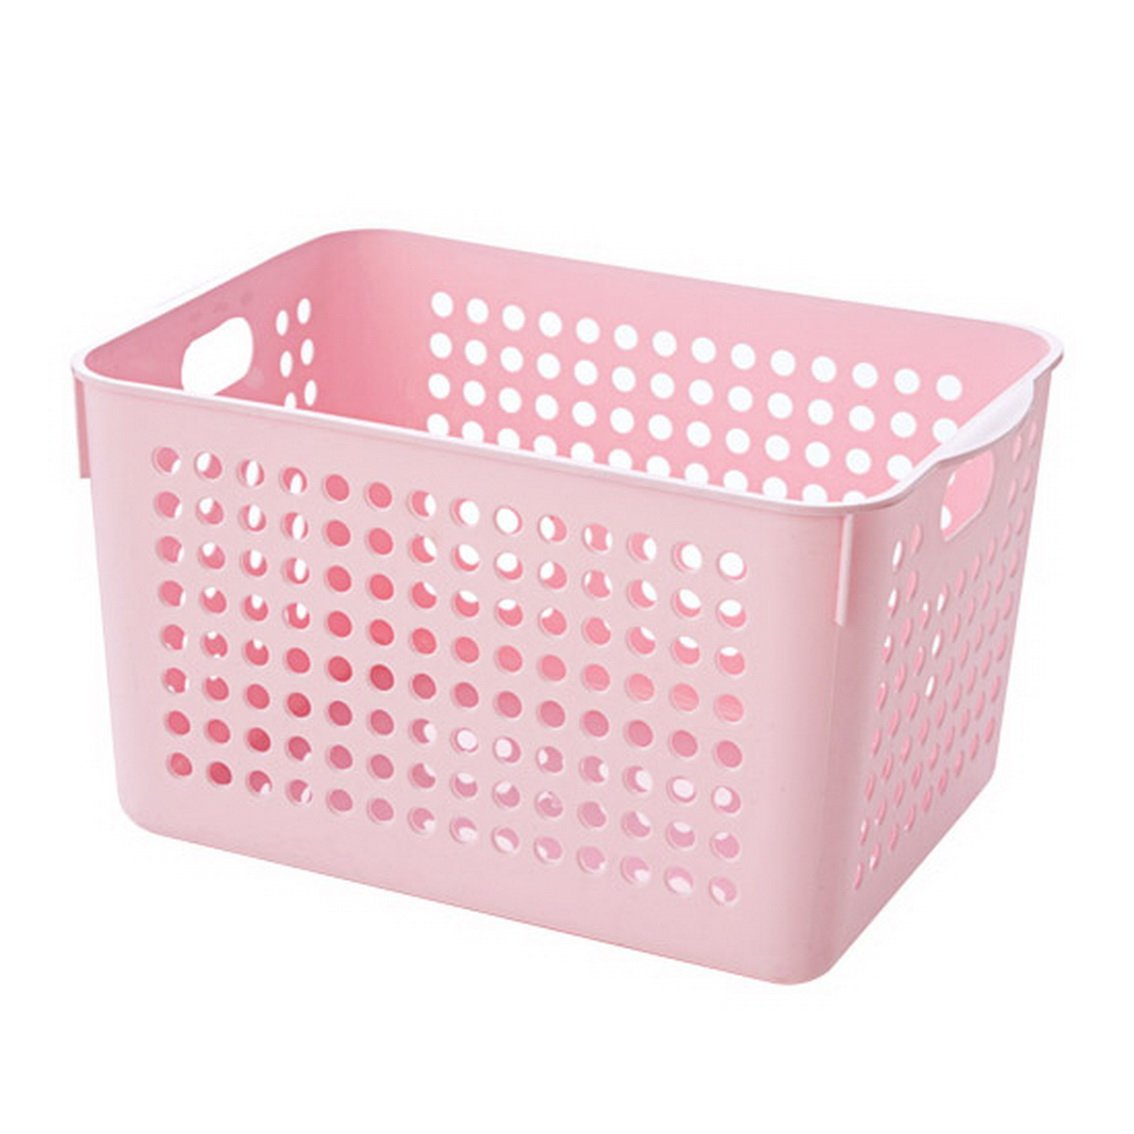 fengg2030shann Plastic hollow storage baskets bathroom Desktop storage baskets kitchen snack basket storage basket storage box. Bathroom basket storage basket storage basket storage basket basket stor